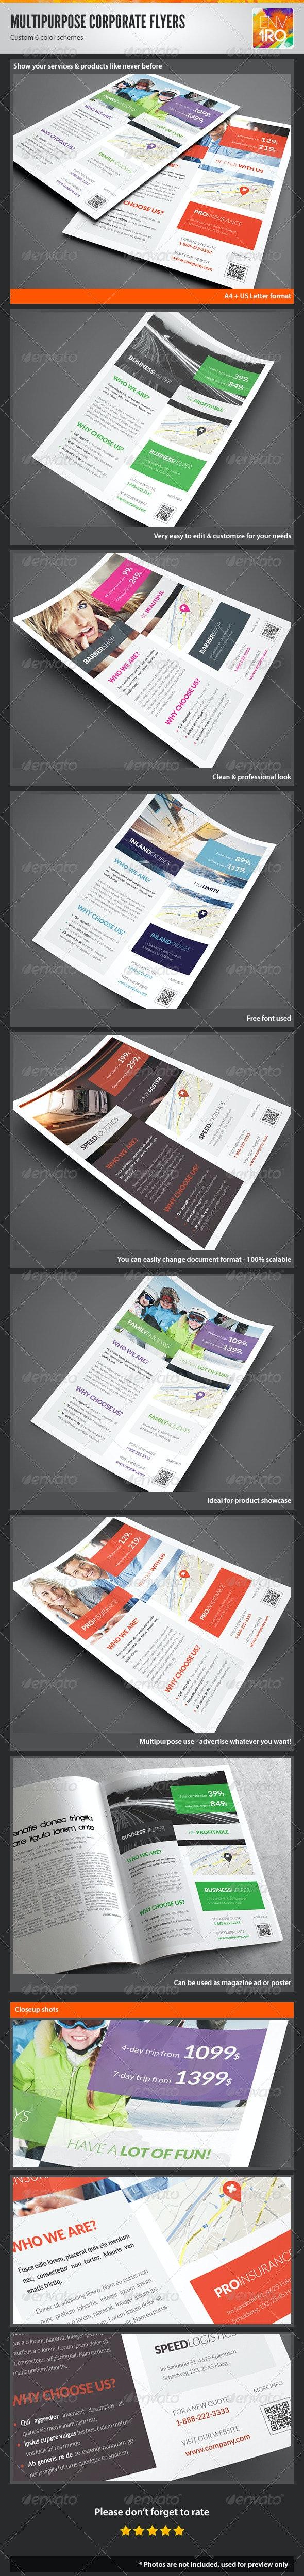 Multipurpose Corporate Flyers, Magazine Ads Vol 12 - Corporate Flyers